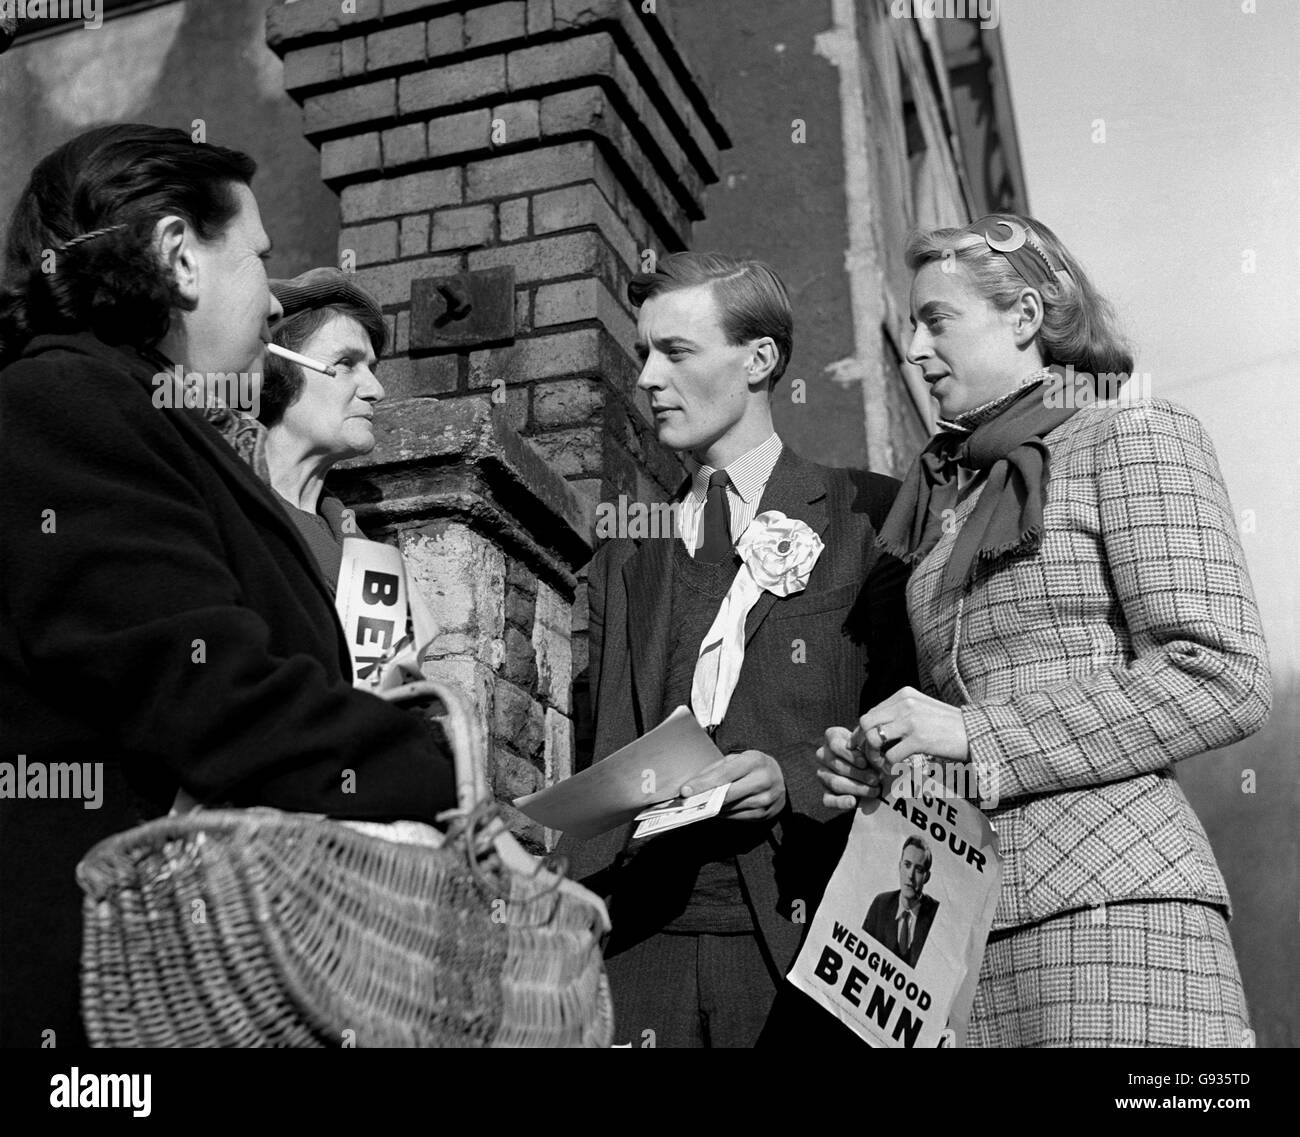 Tony Benn Canvassing 1950 - Stock Image